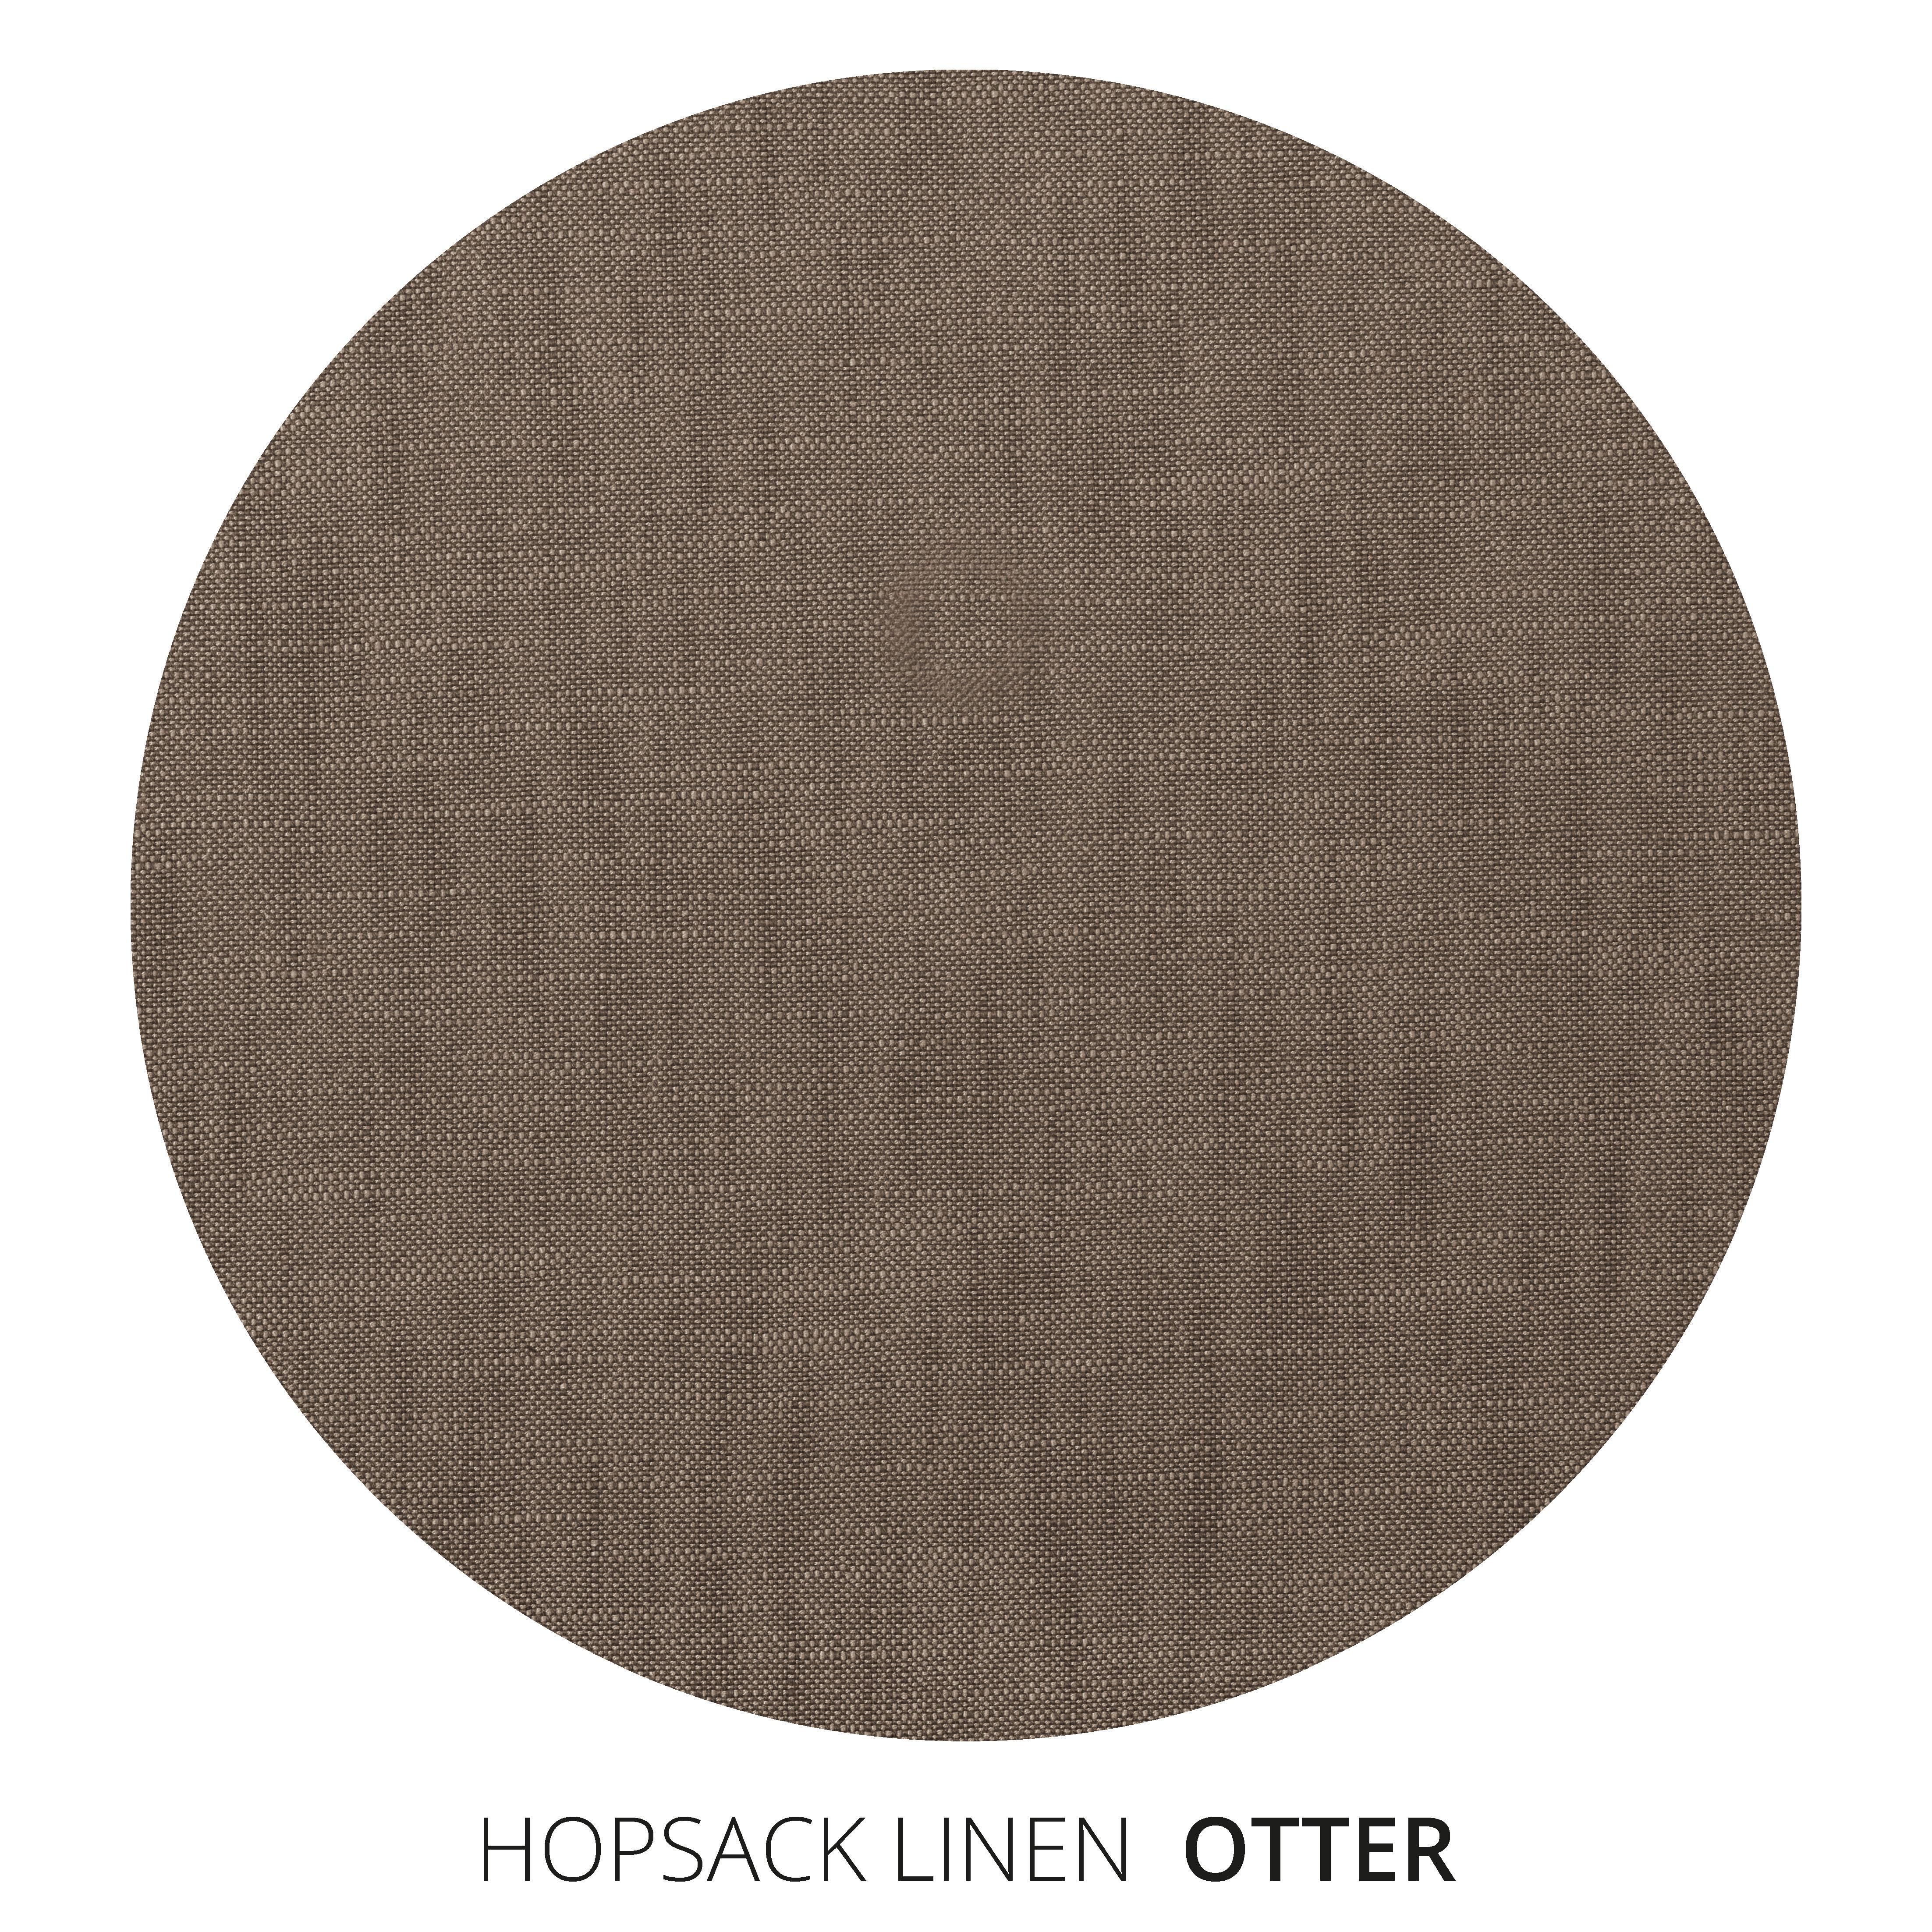 Otter Hopsack Linen Swatch